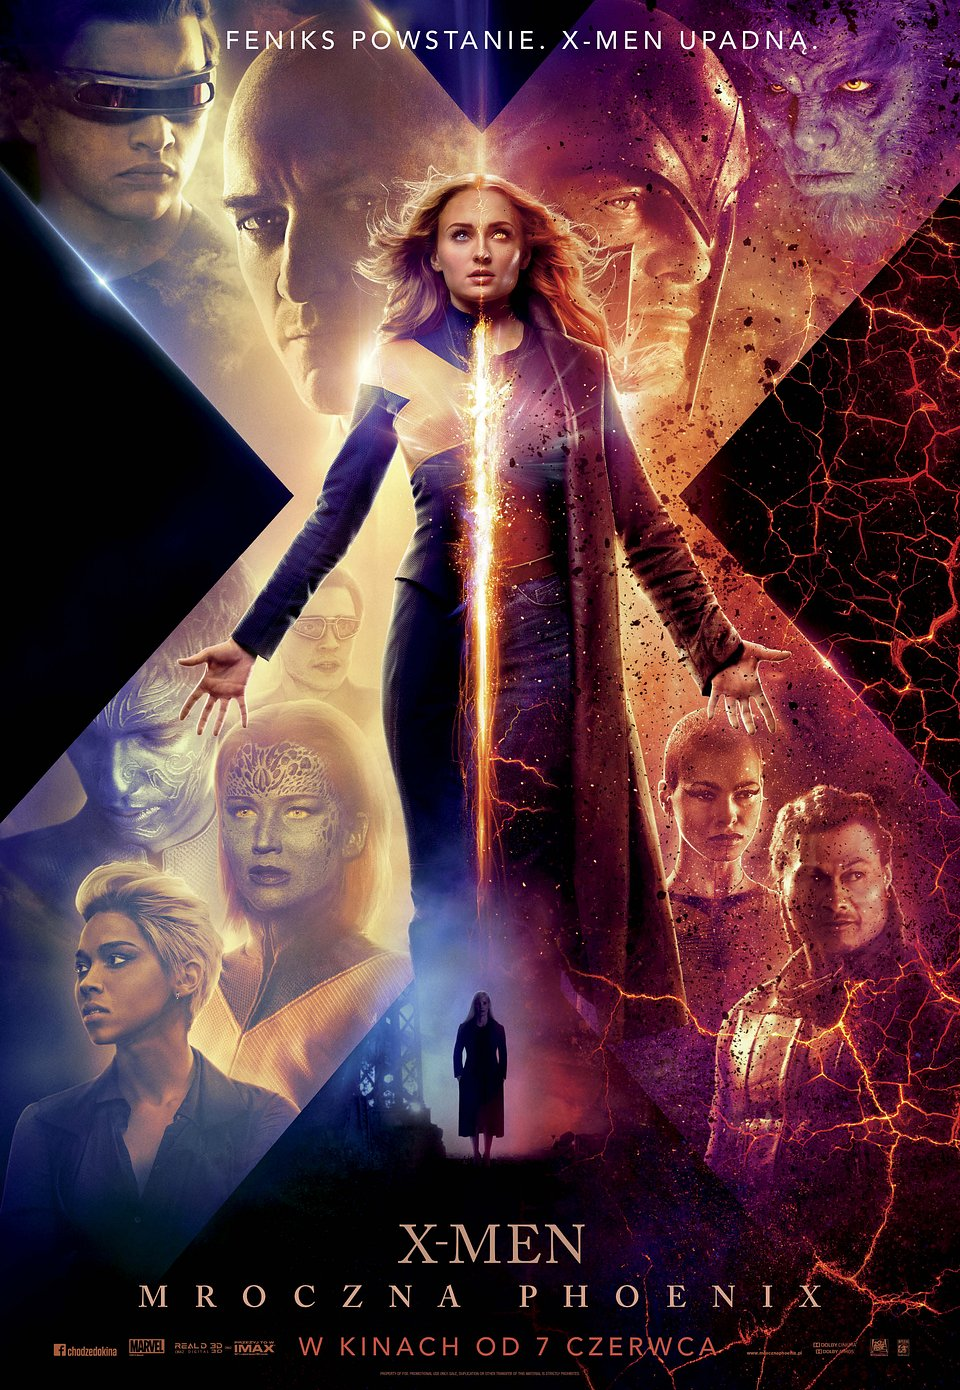 Mroczna Phoenix plakat.jpg